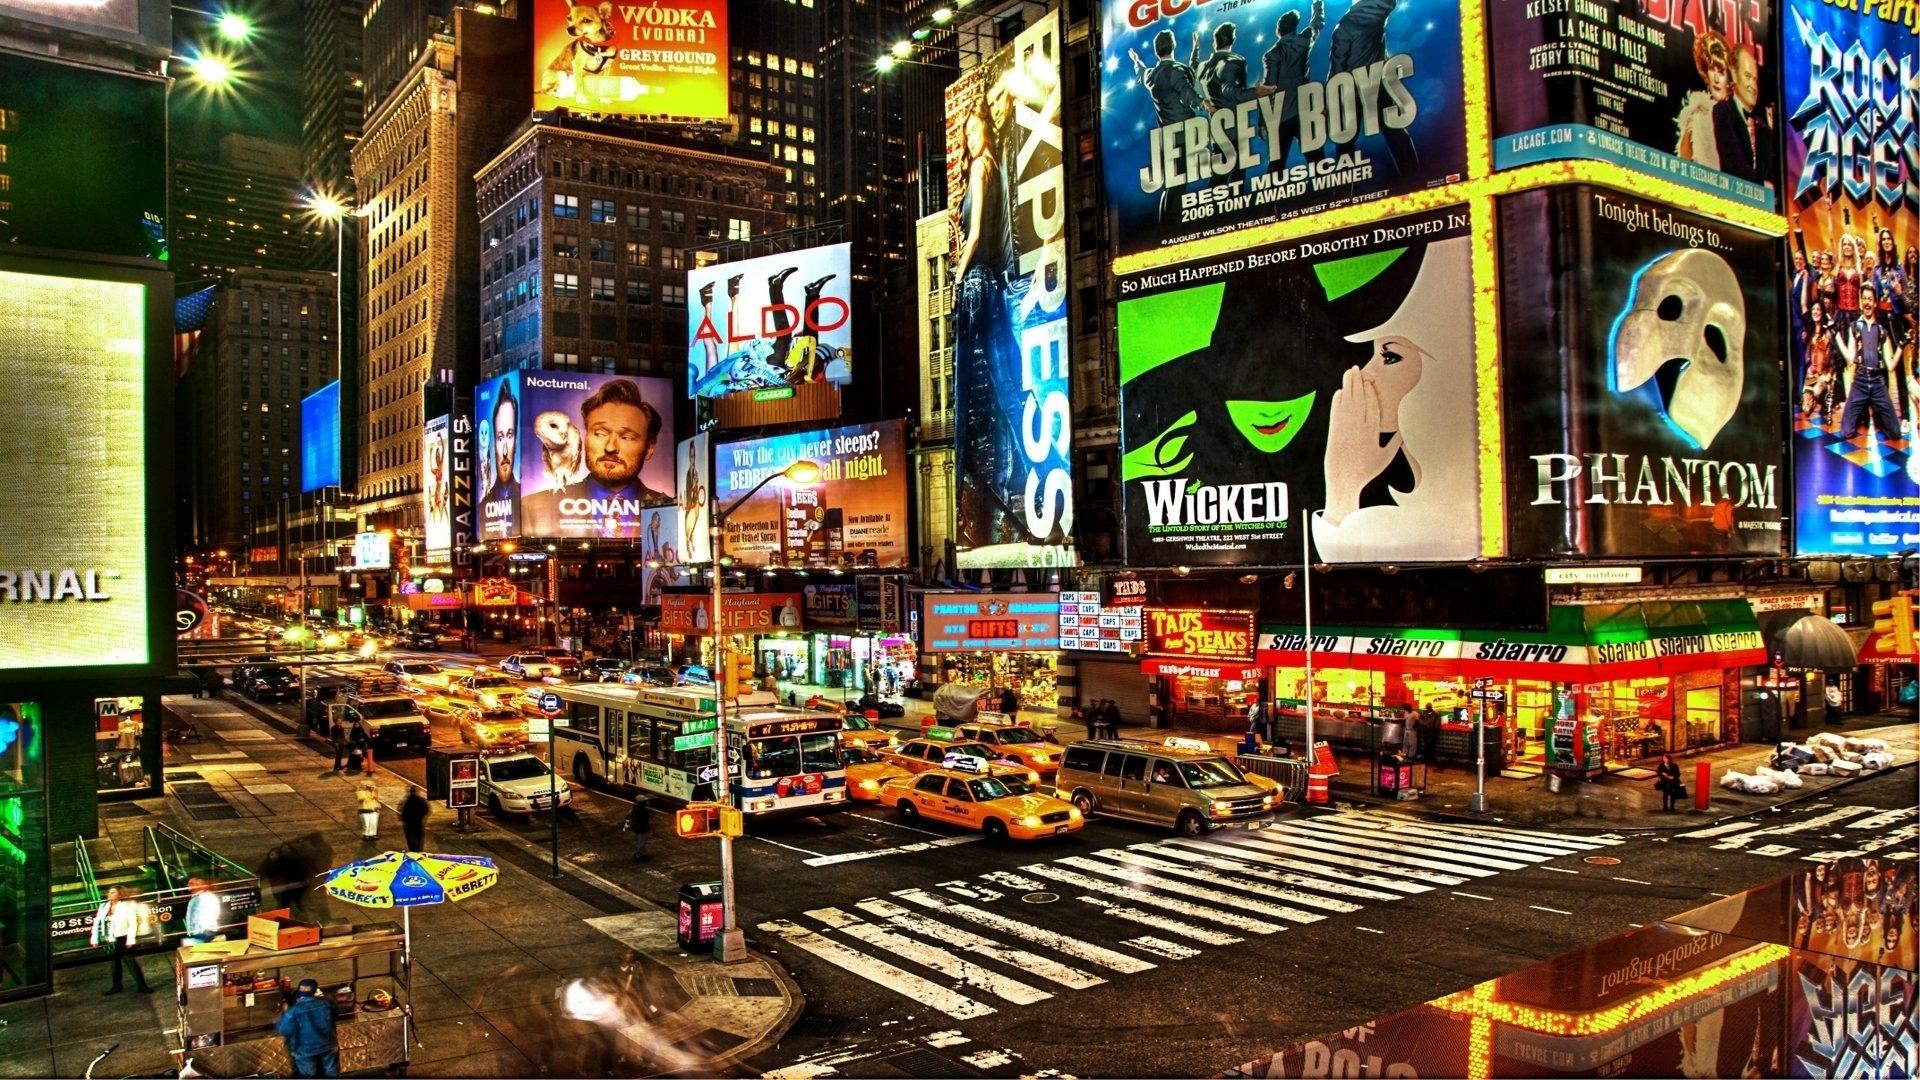 Midtown n y c full hd fond d 39 cran and arri re plan for Photo ecran times square